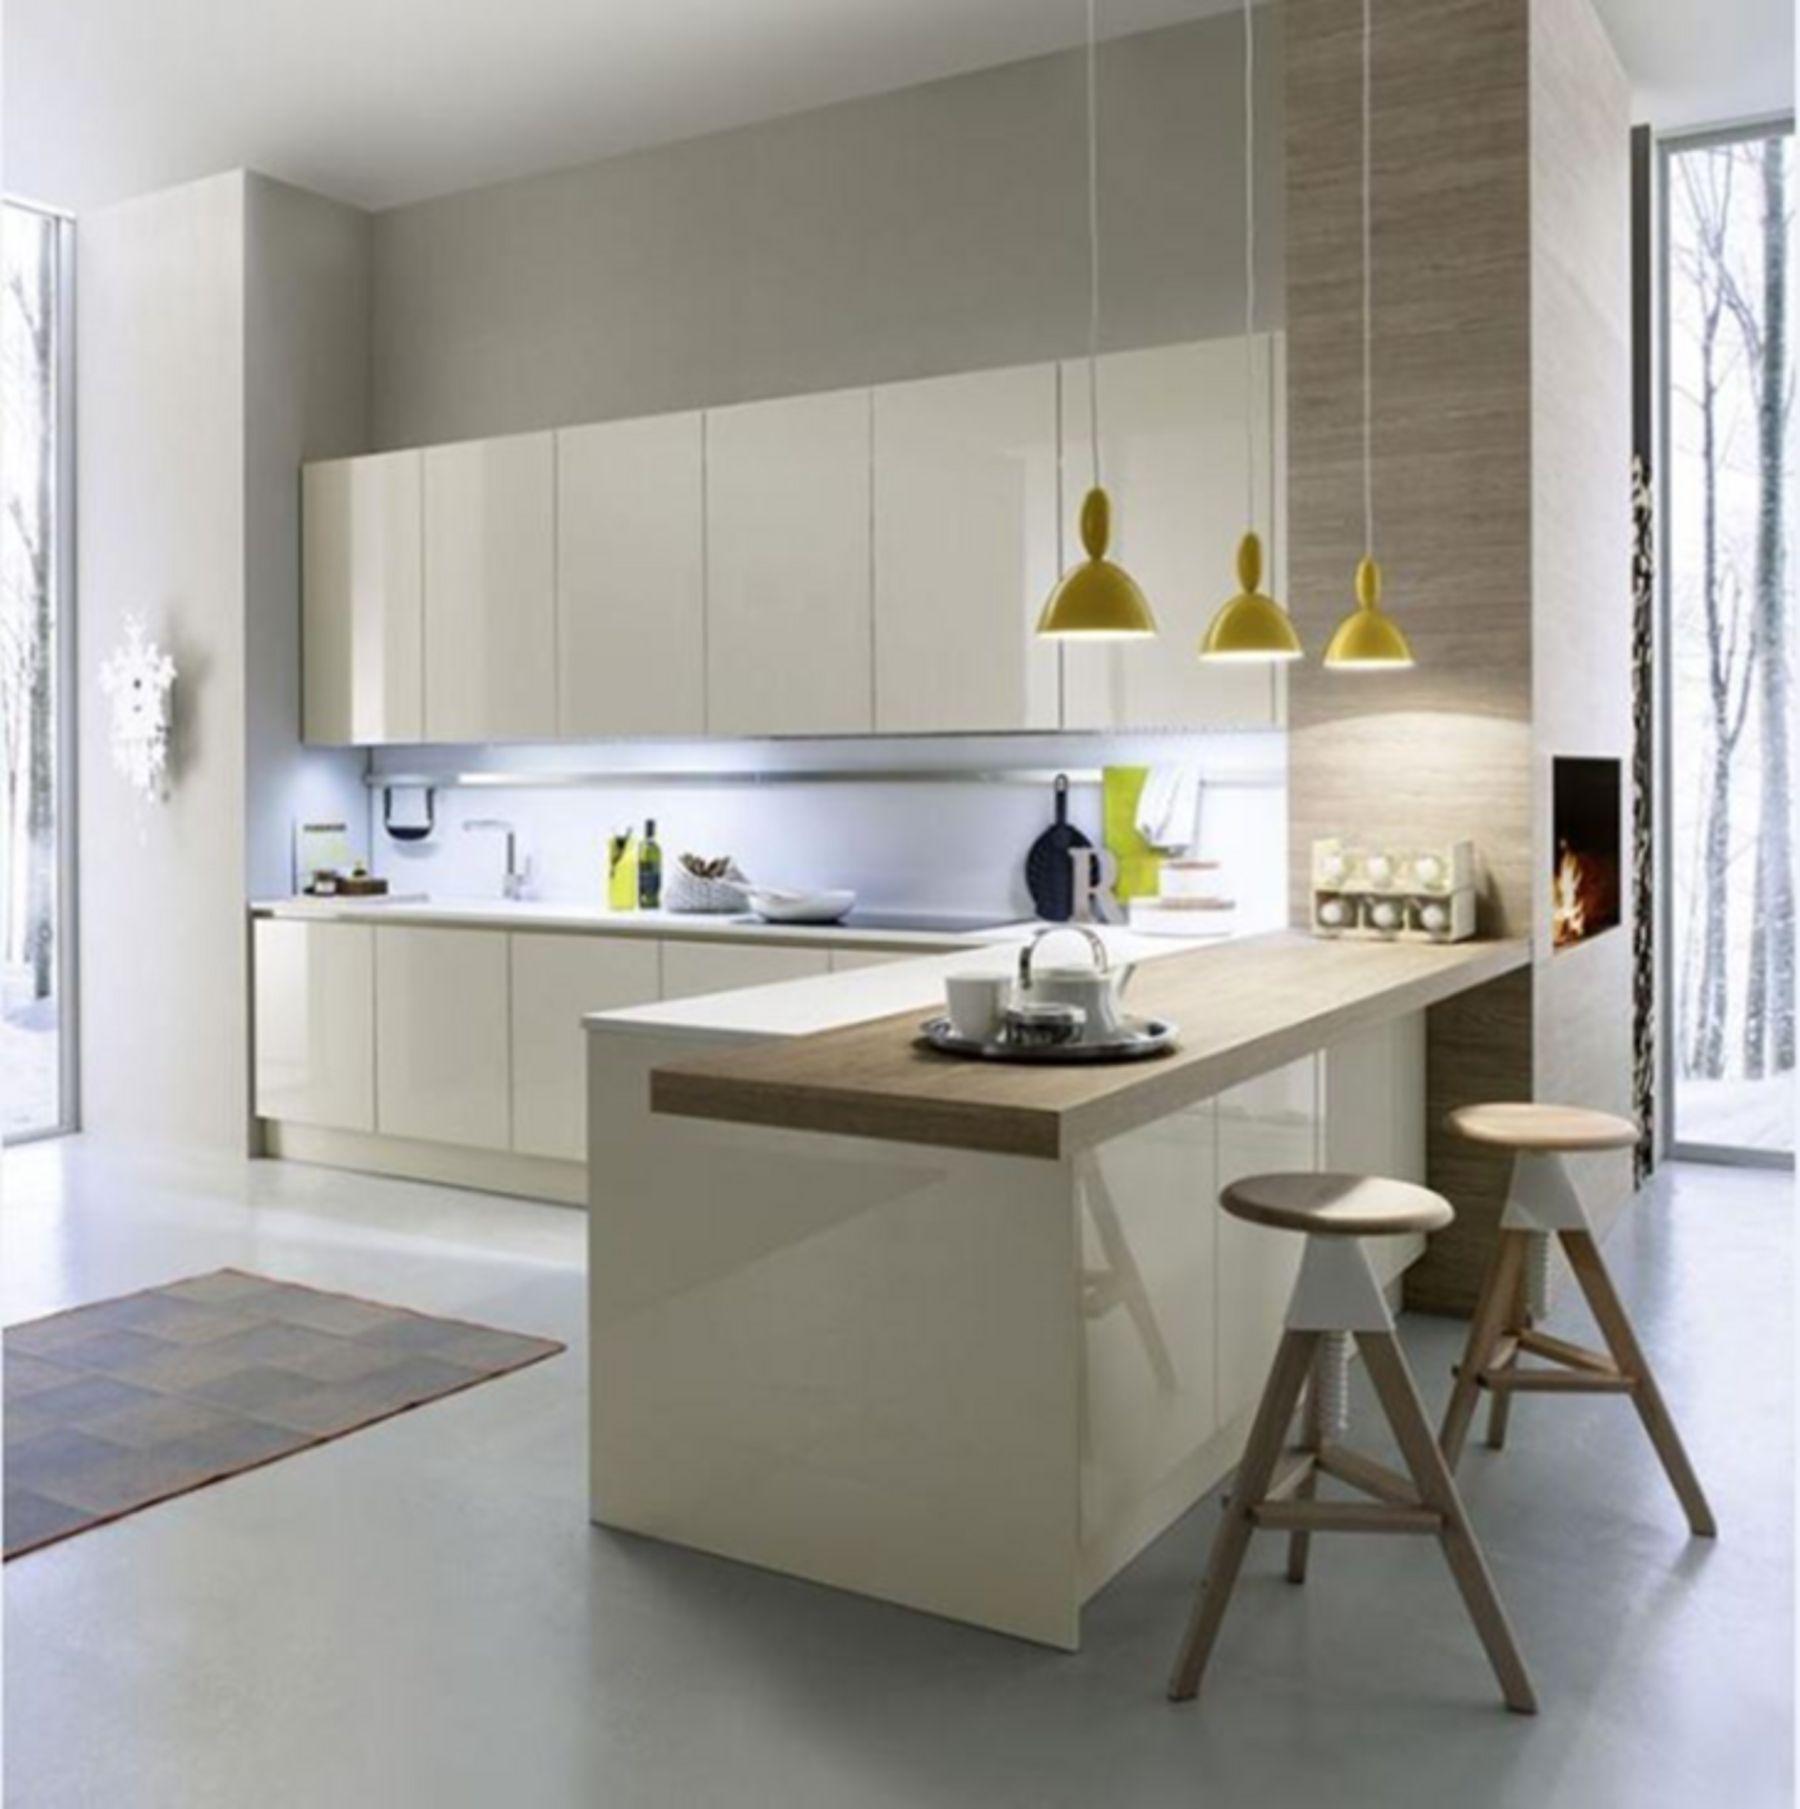 Interesting 10 Minimalist Kitchen Set Design Ideas For Your